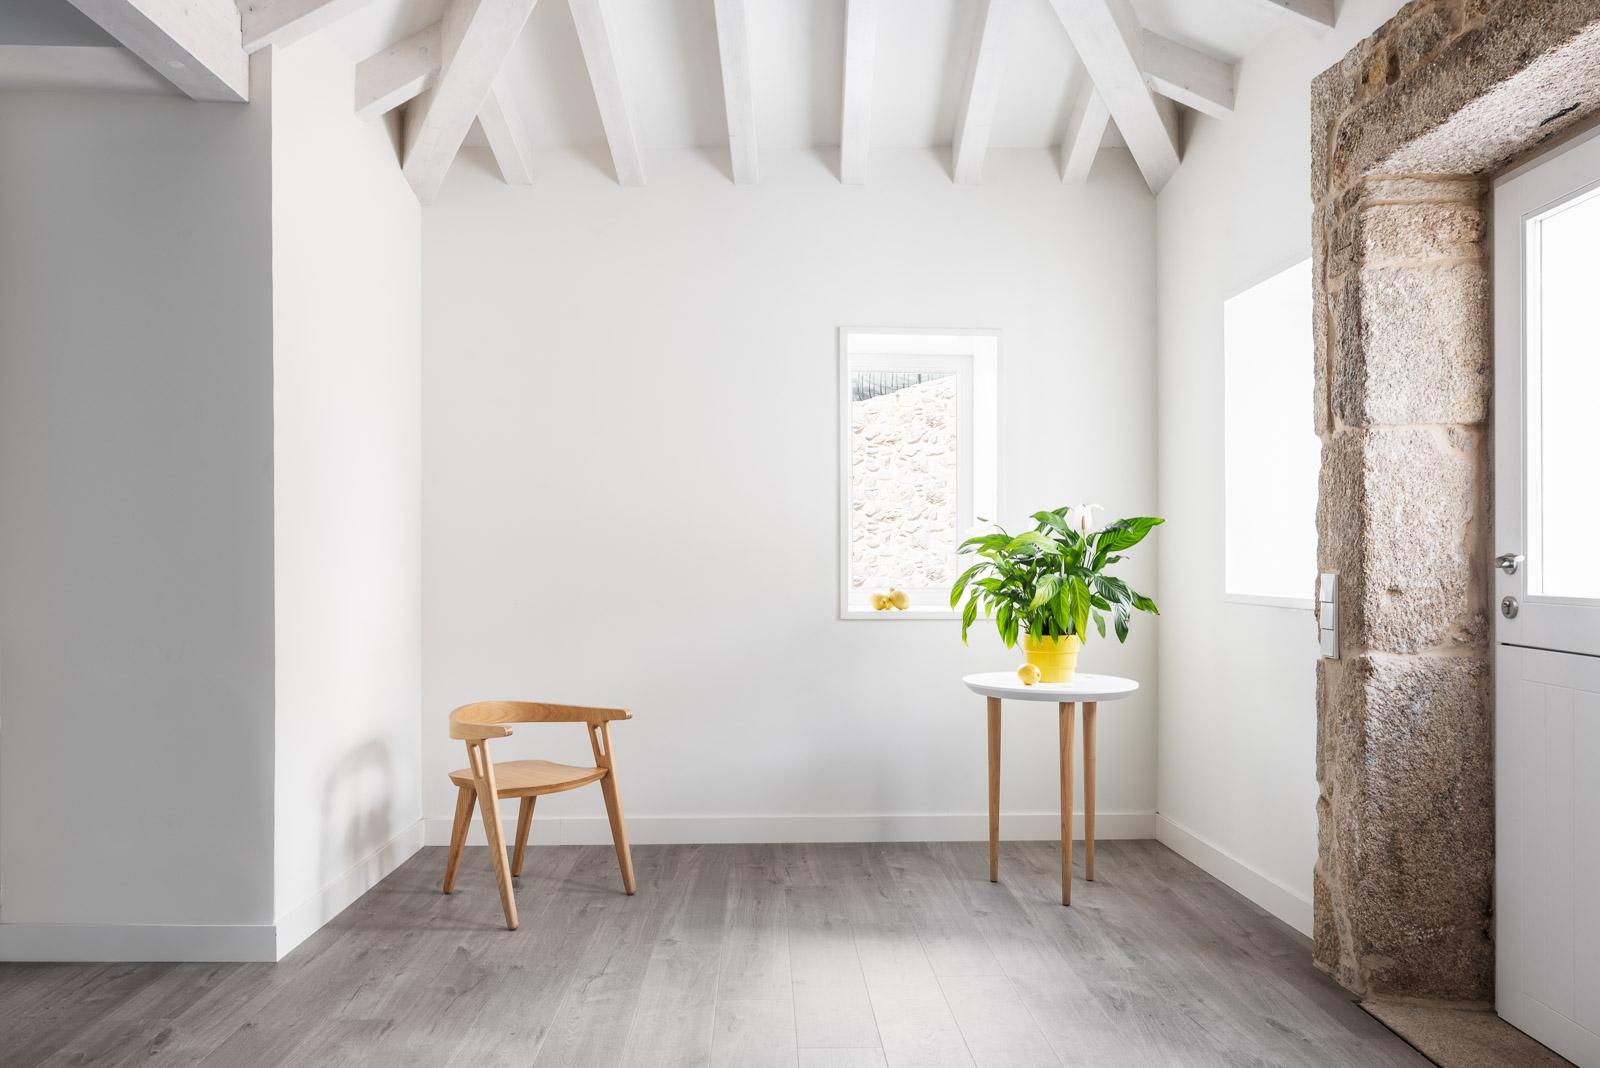 Lemon house - fotografía de arquitectura en galicia